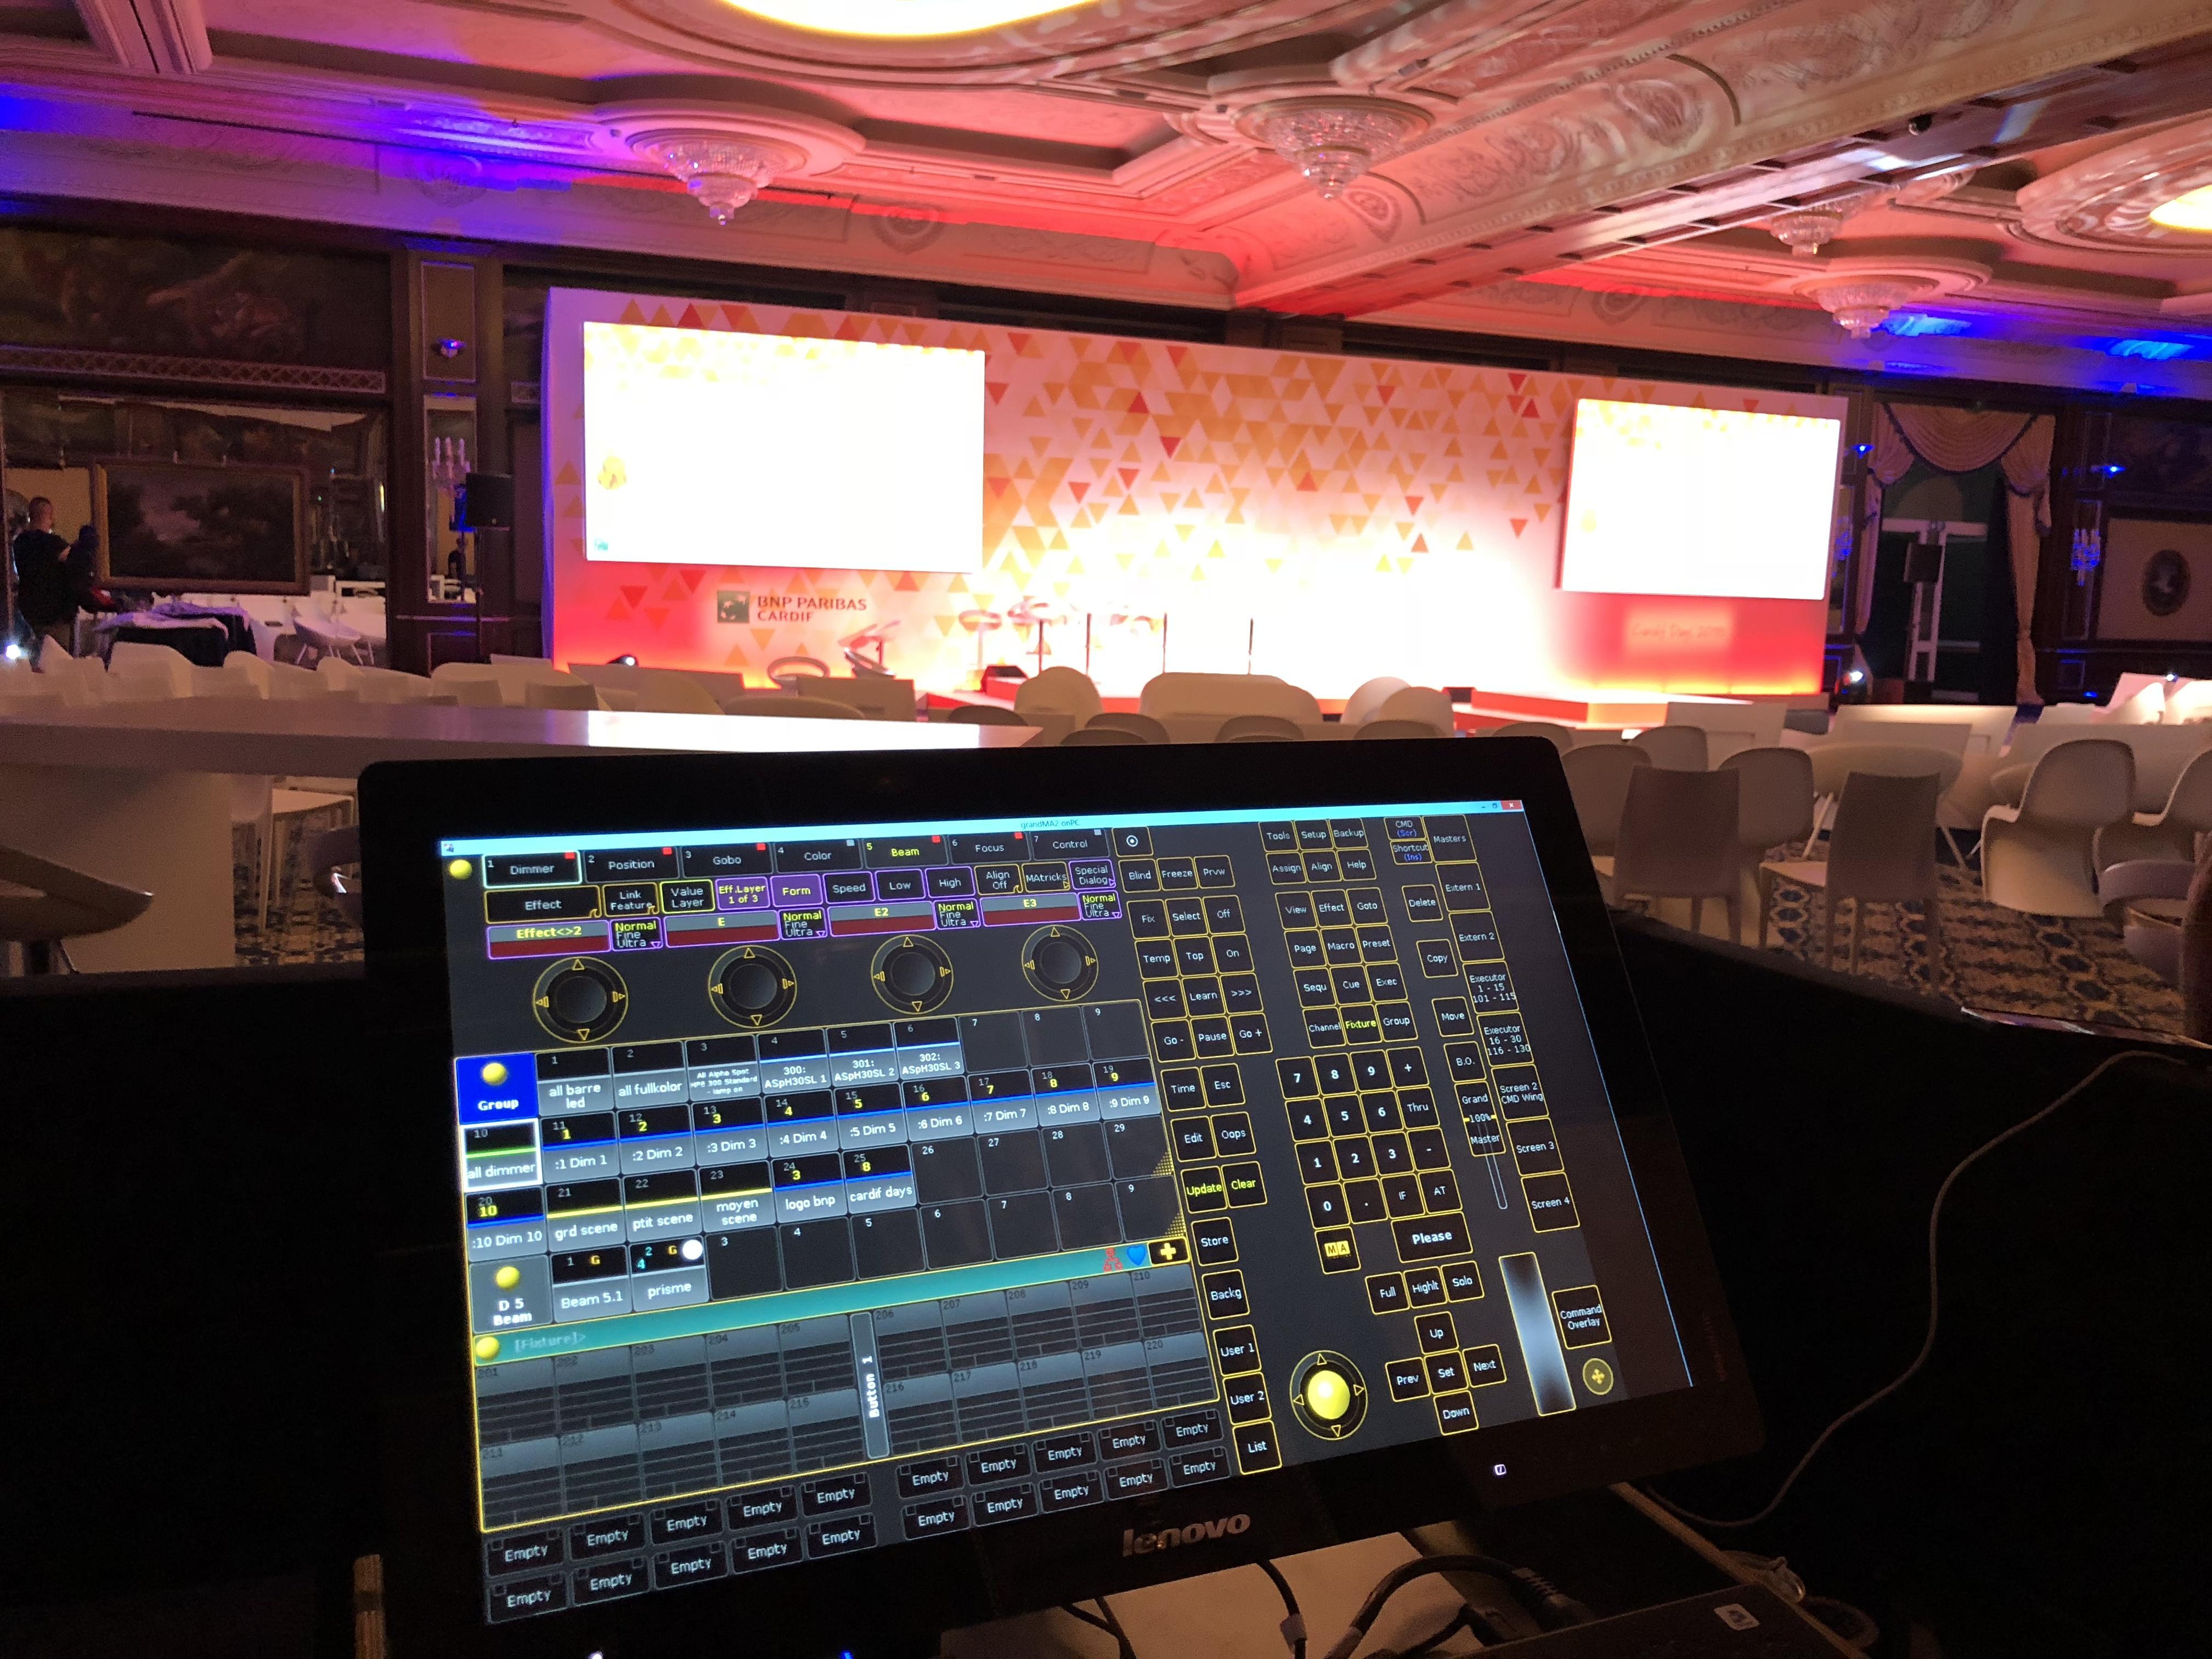 aucop-event-italie-twobevents-lac majeurs-on-video-deco-scene-ecrans-audiovisuel-Grand Hotel Dino-bnp paribas